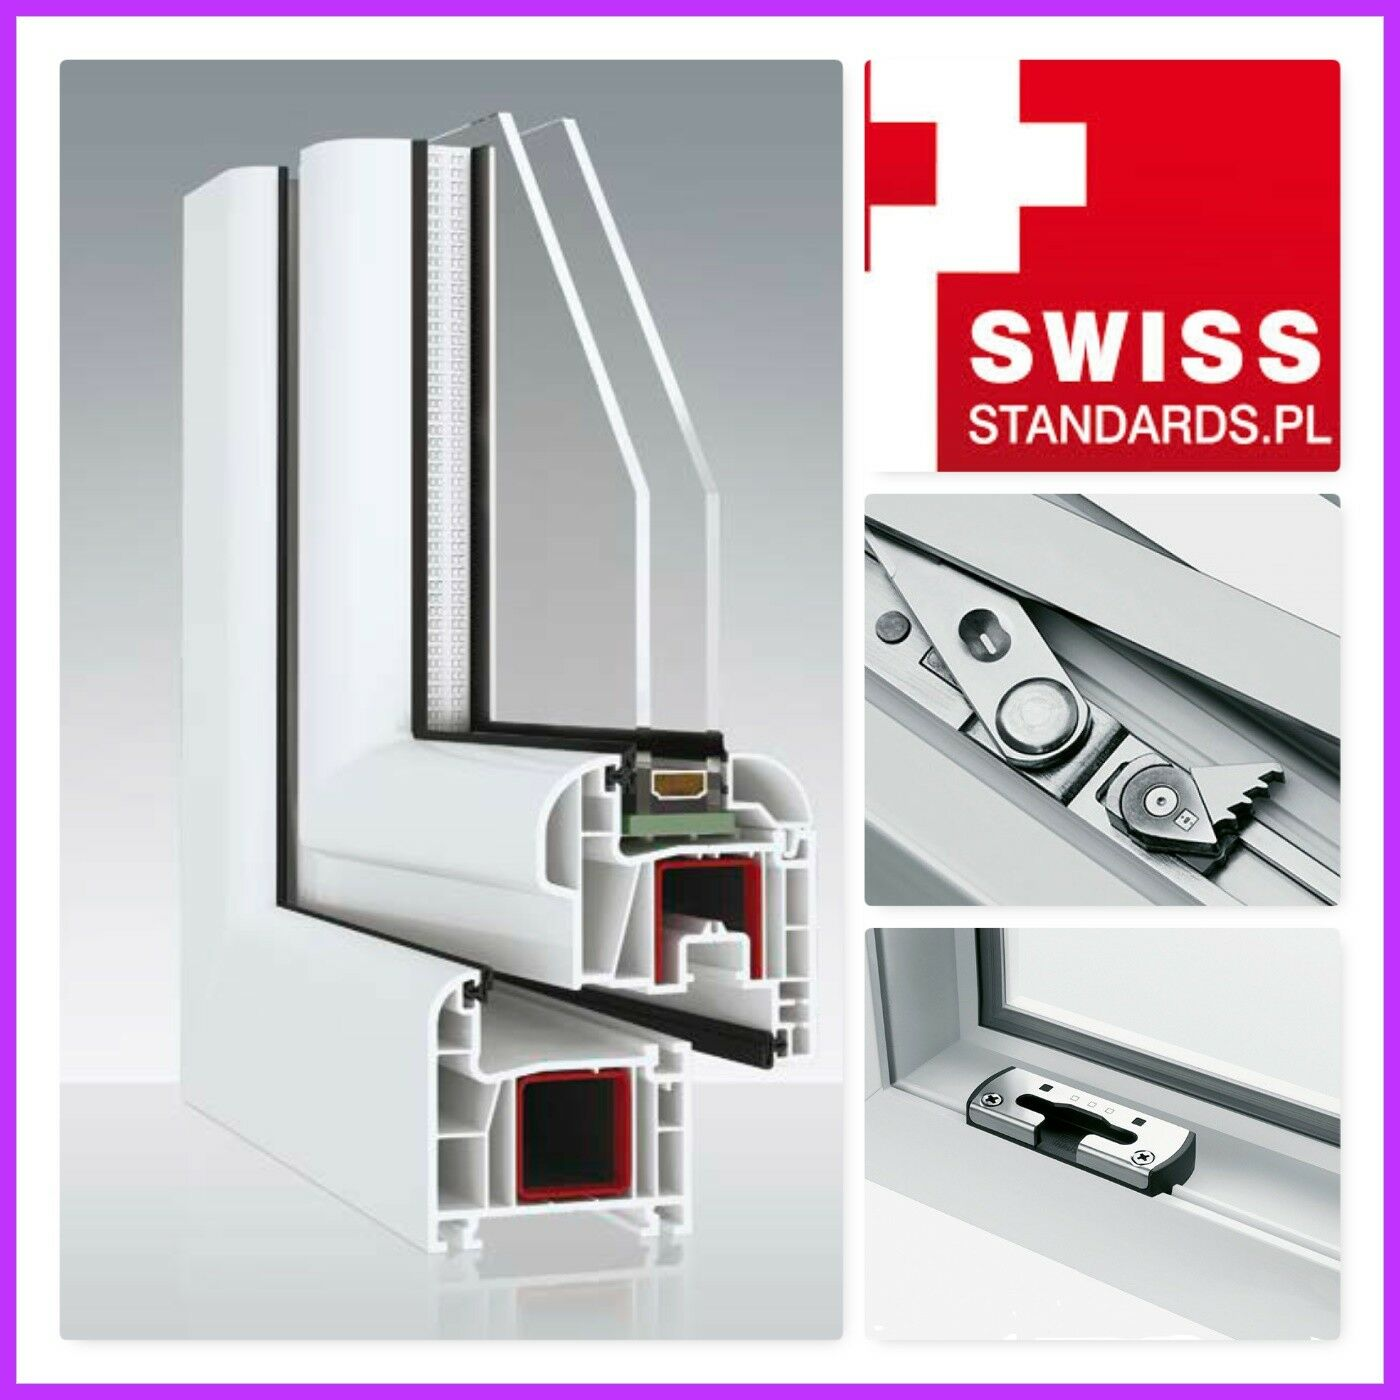 Kunststofffenster kellerfenster fenster 2 3 fach for Wohnraumfenster kunststoff